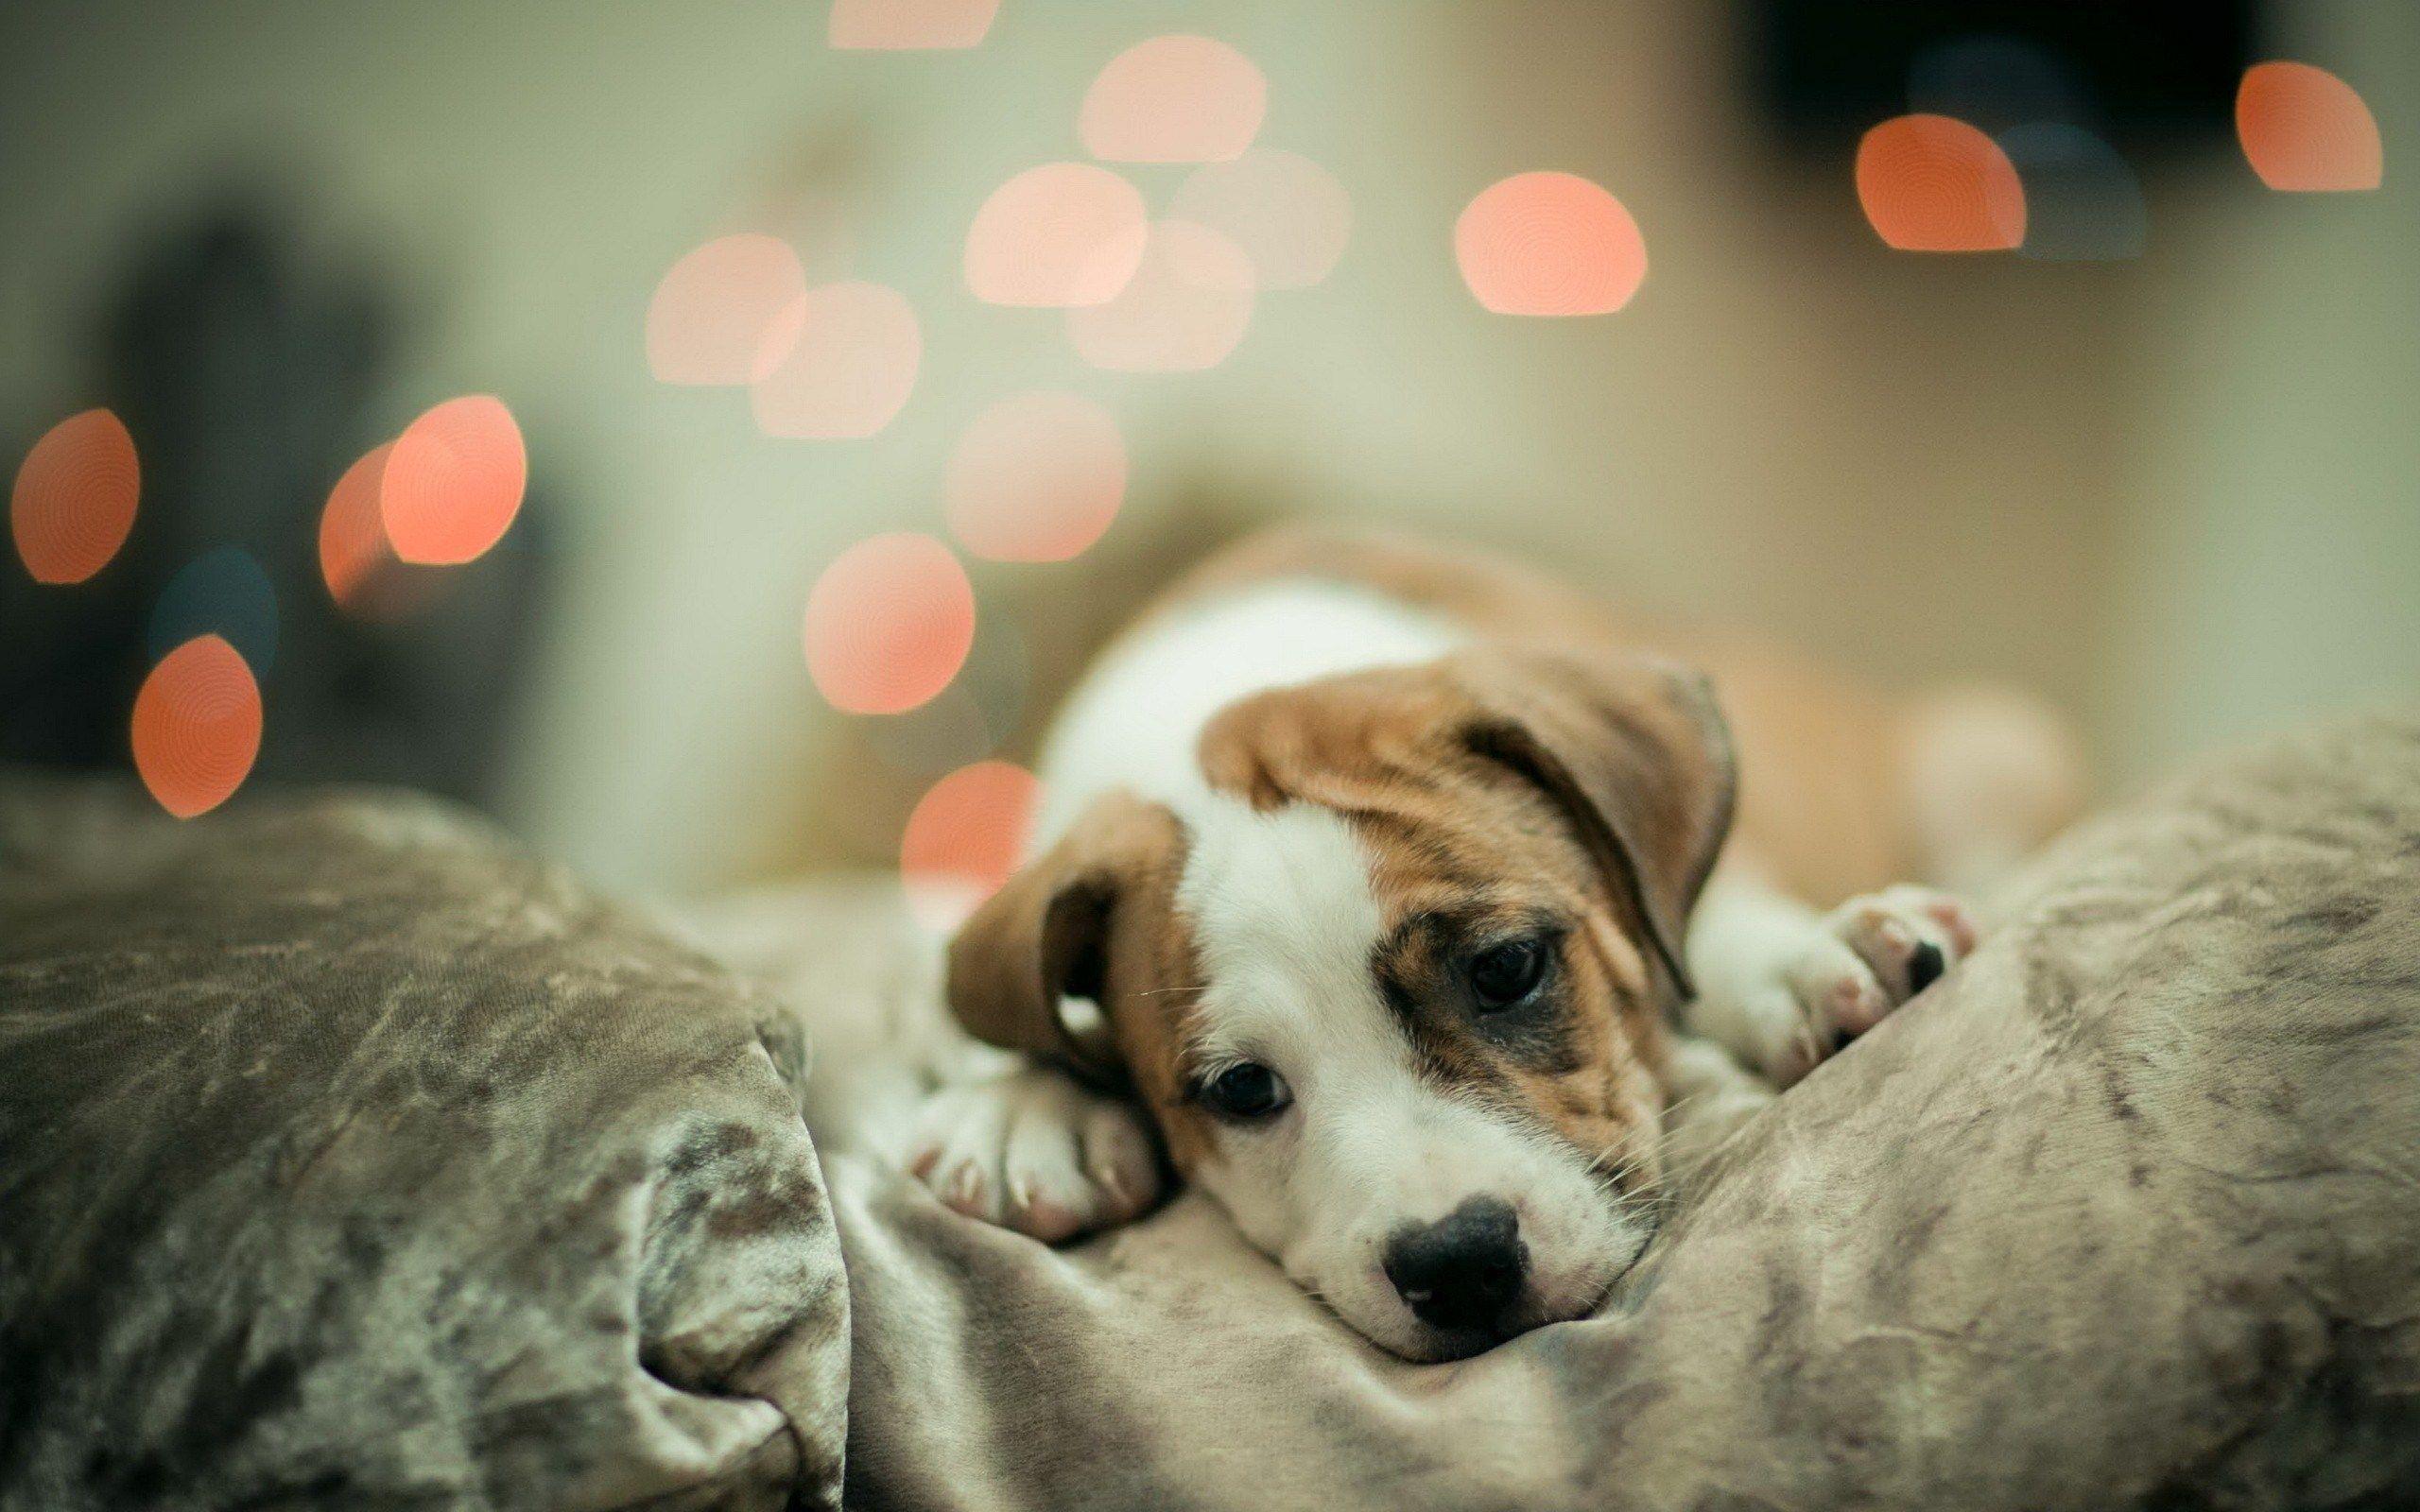 Cute Dog Wallpapers Desktop Mobile (10) Dog wallpaper